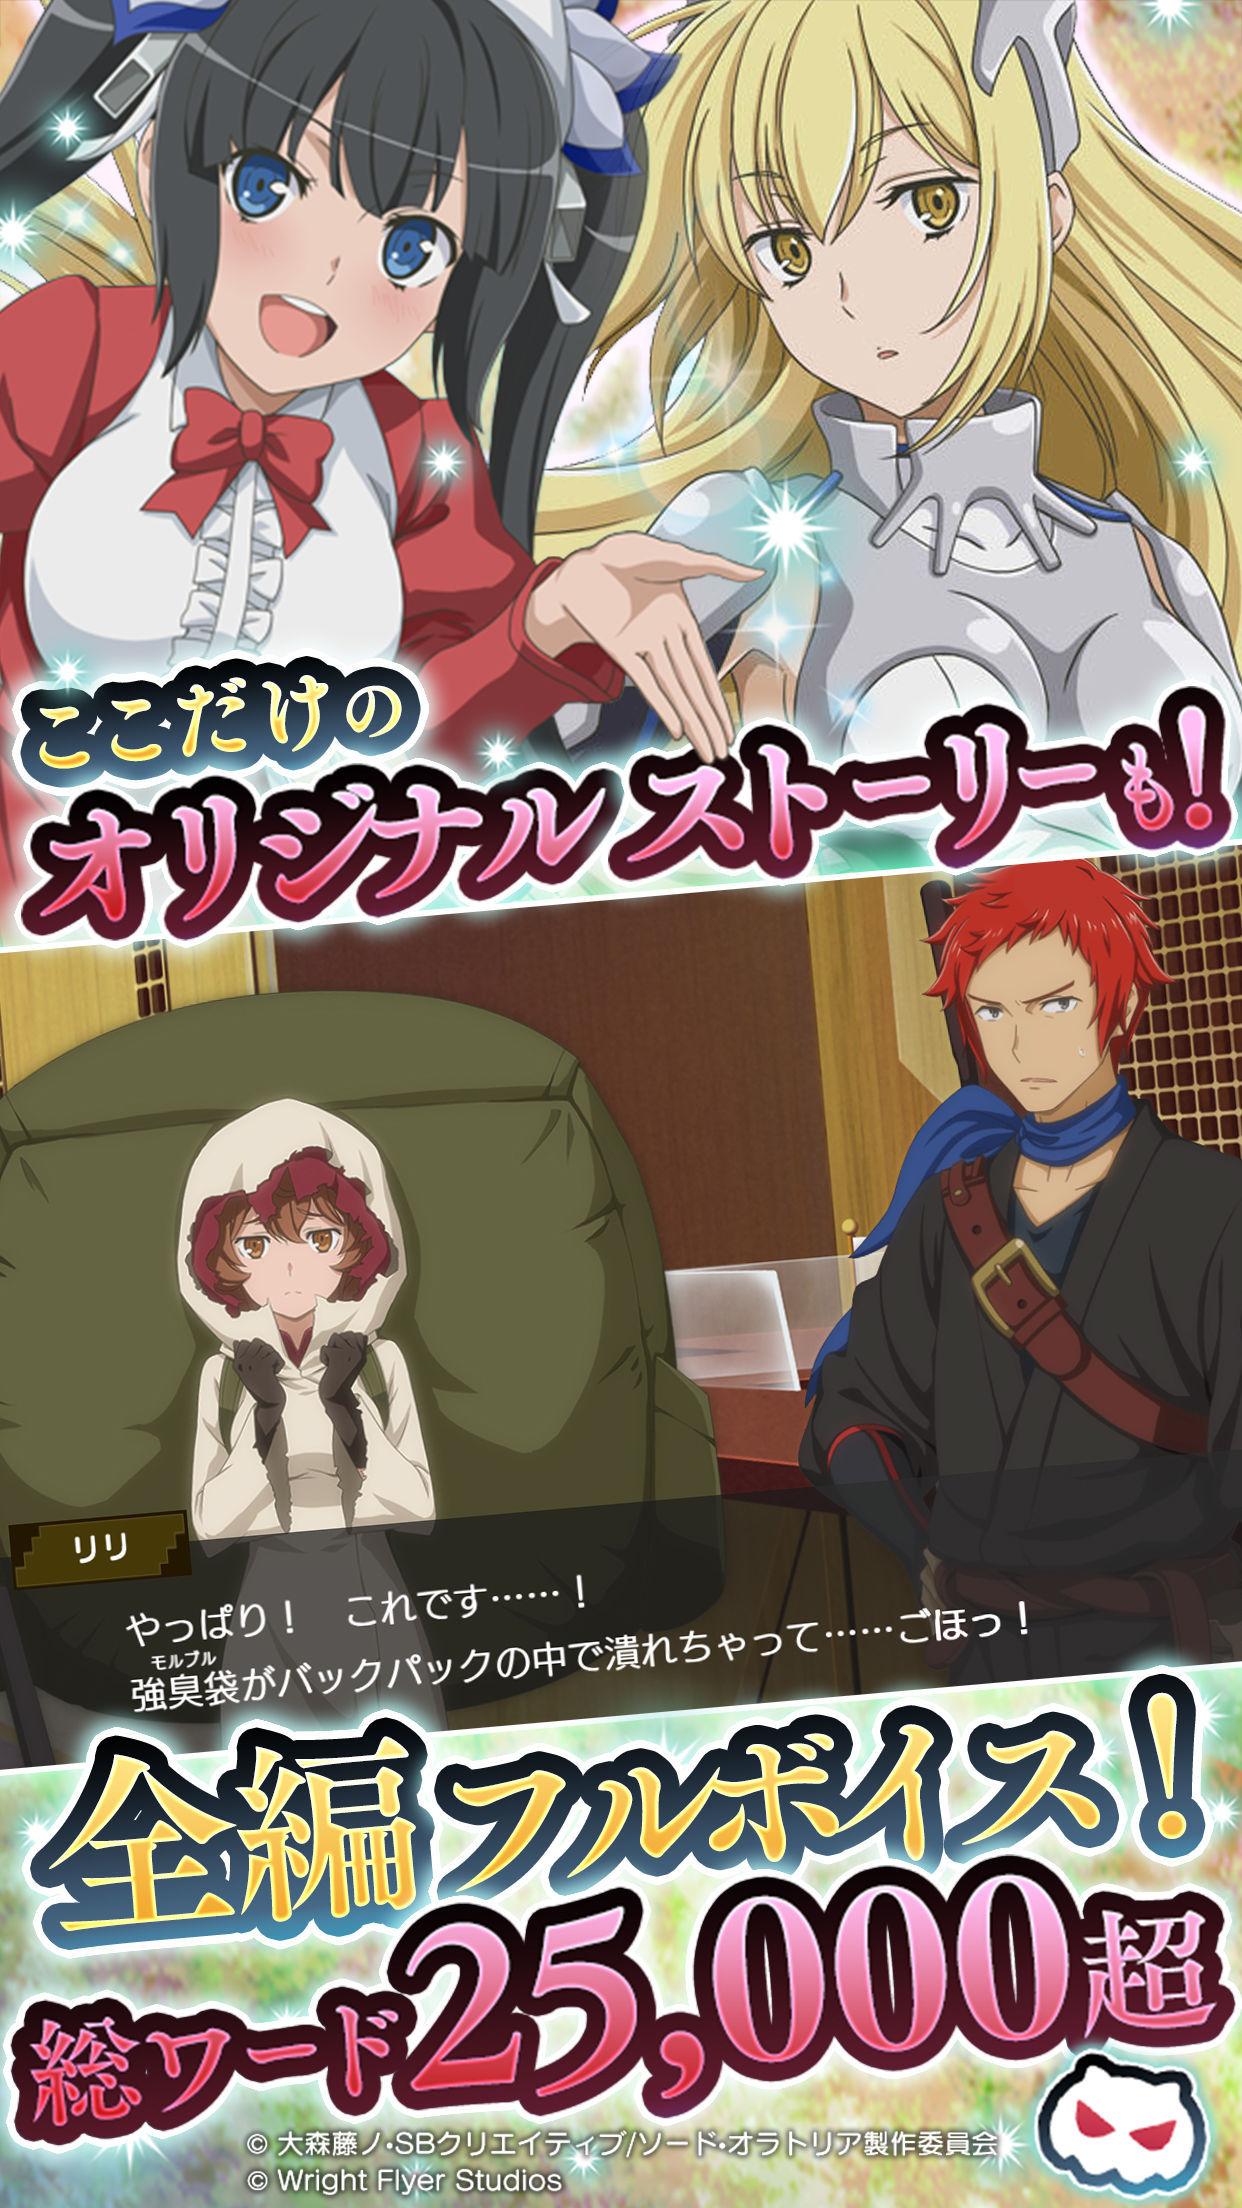 Crunchyroll localizing/publishing Japanese mobile games, GREE's